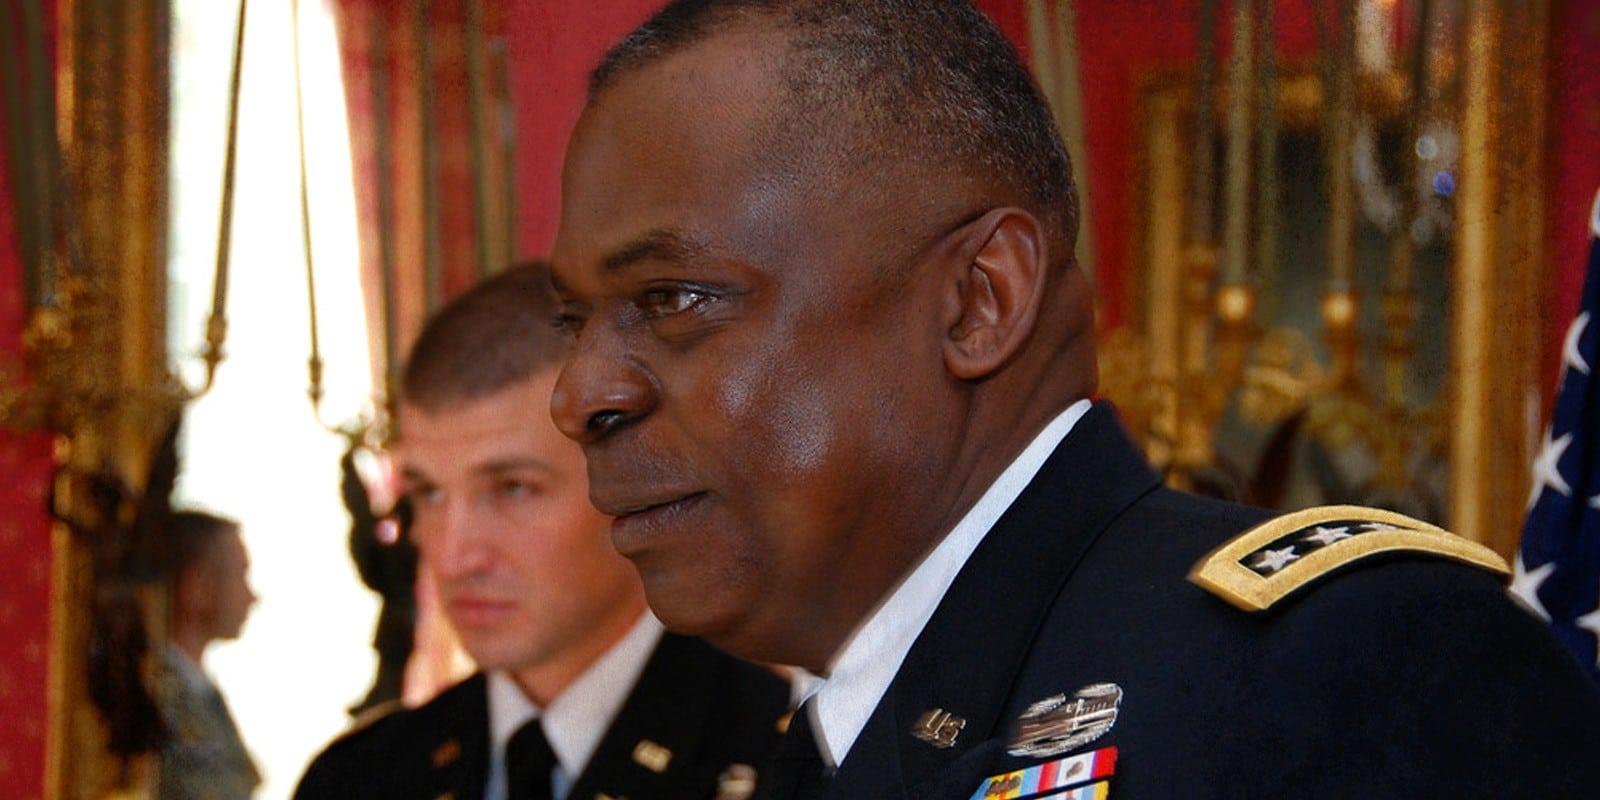 Gen. Lloyd Austin III, Vice Chief of Staff of the U.S. Army